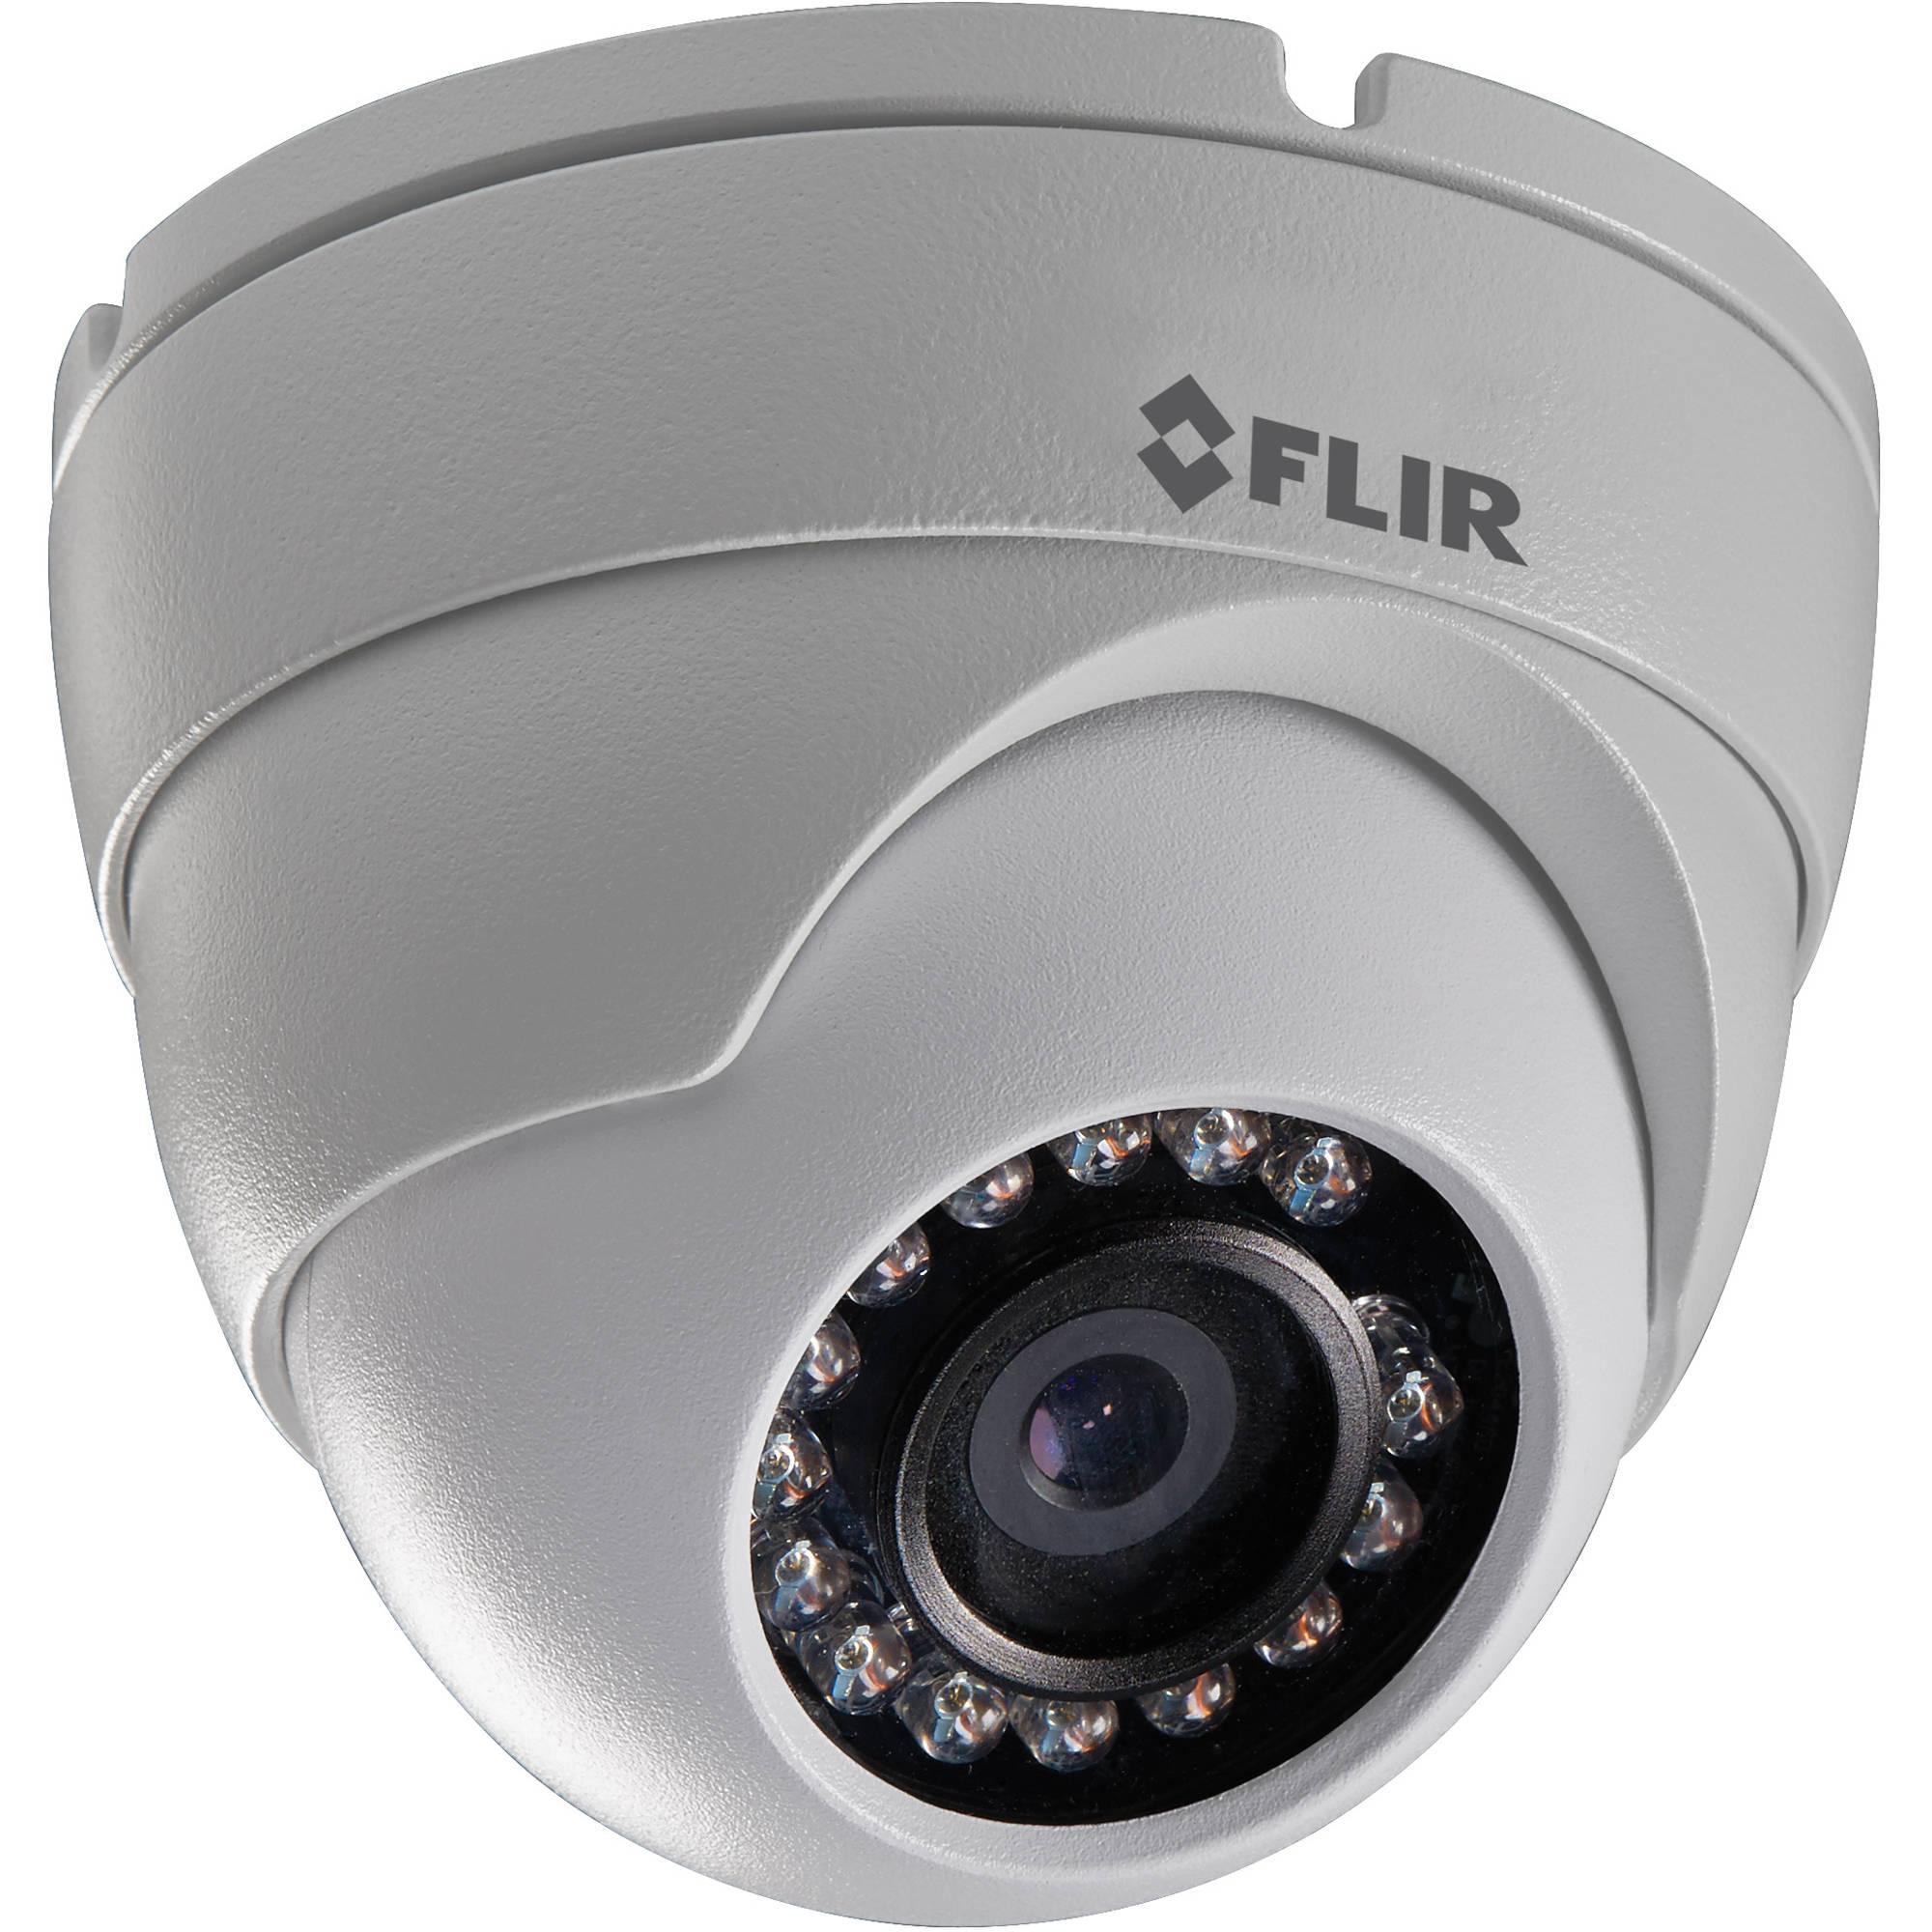 FLIR 2.1MP Outdoor Dome Camera N133ED B&H Photo Video